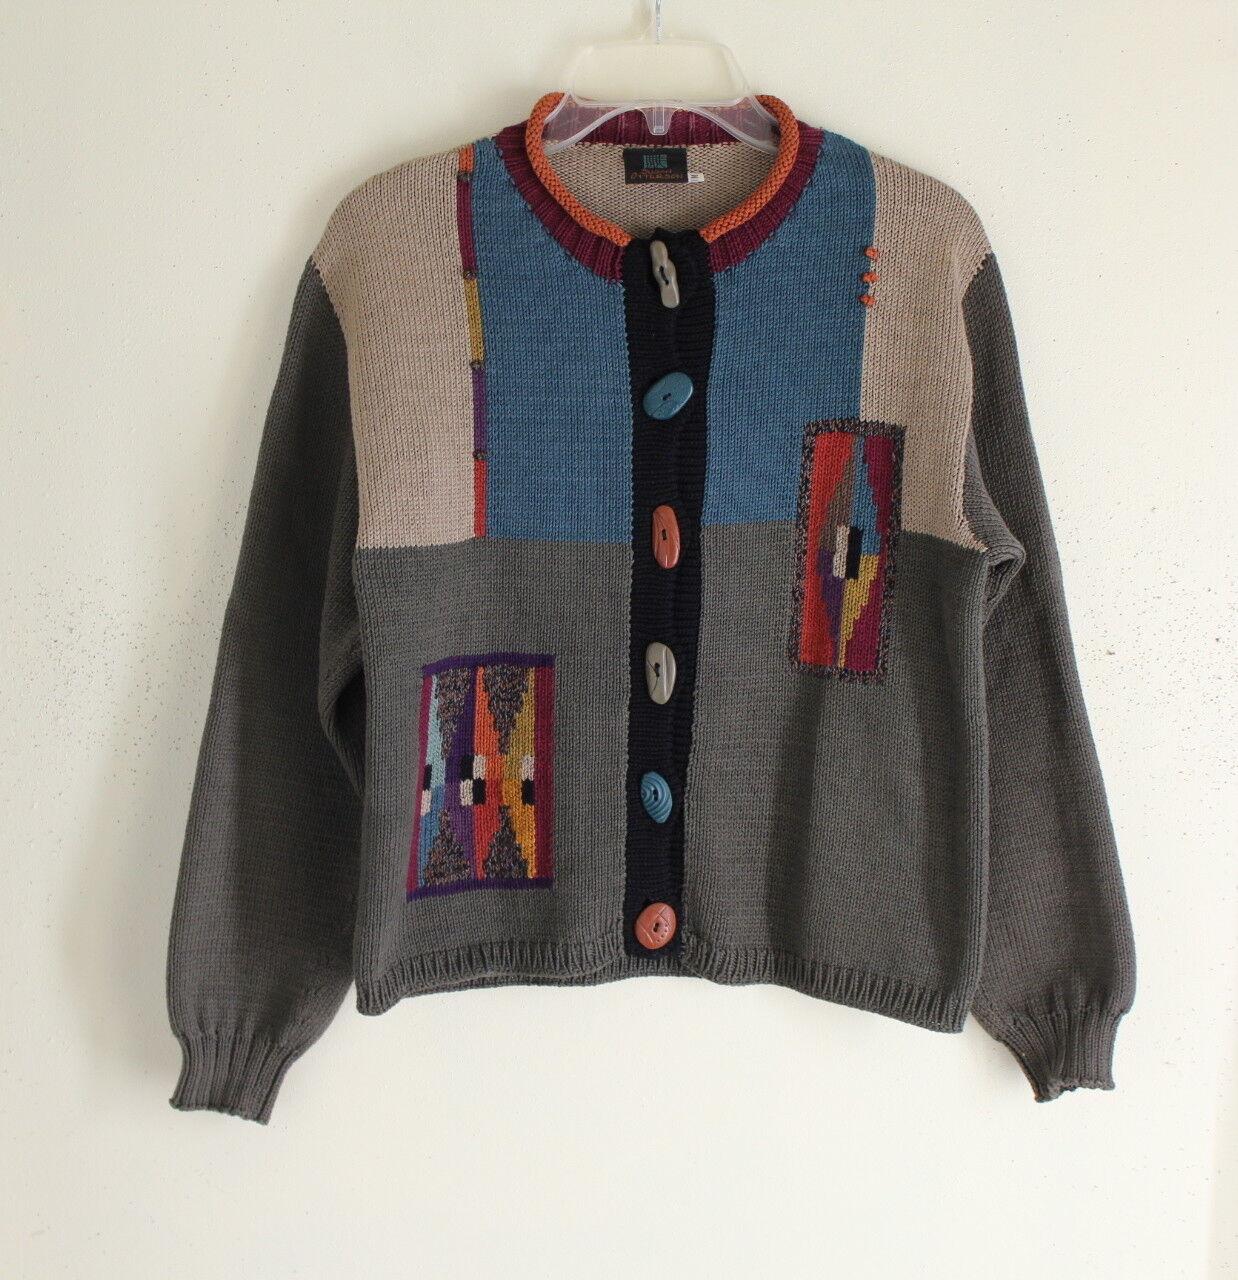 Susan Otterson, Sz M Fiber konstist konst -to -Wear Funky Hand -Made bildigan tröja